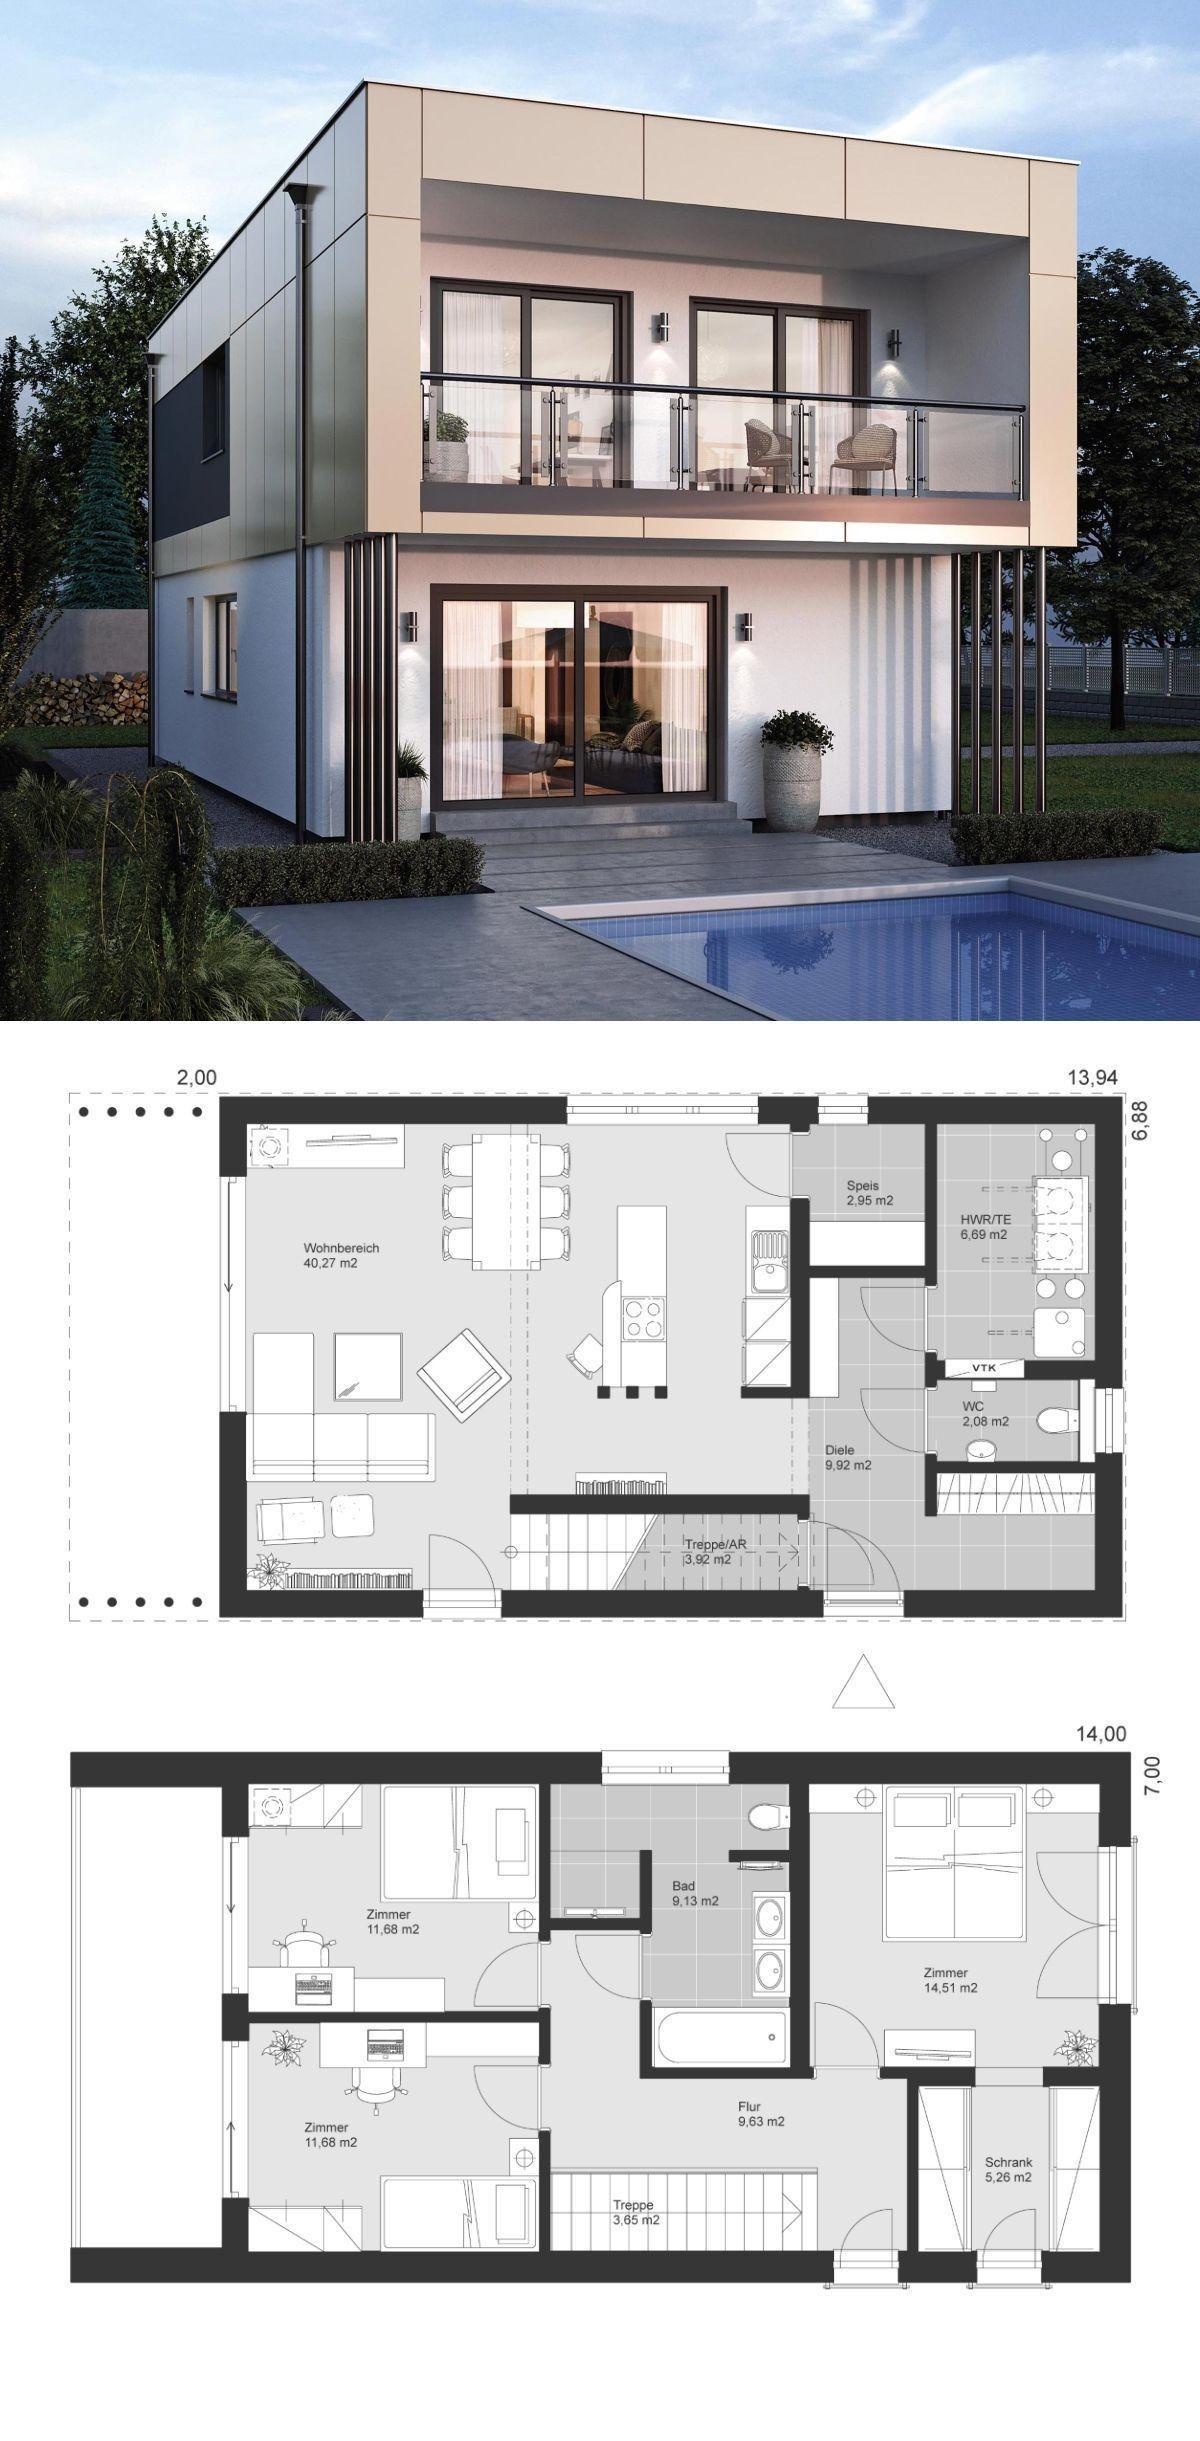 Minimalist House Design Plans 2020 Desain Rumah Minimalis Rumah Arsitektur Arsitektur Minimalis